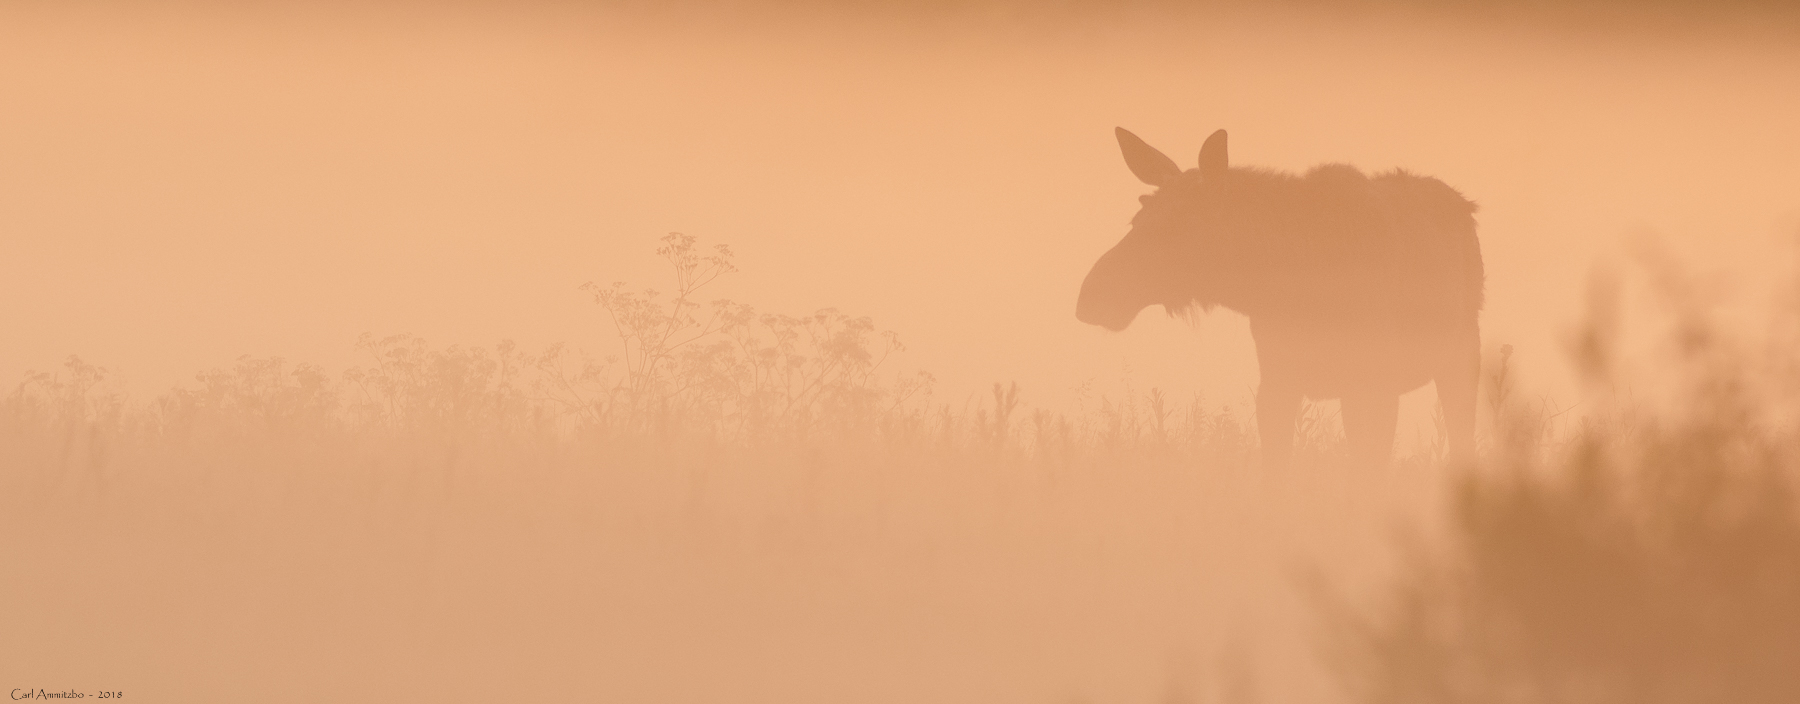 03 - 0609 - Elg i gul dis - 01 - Bergslagen